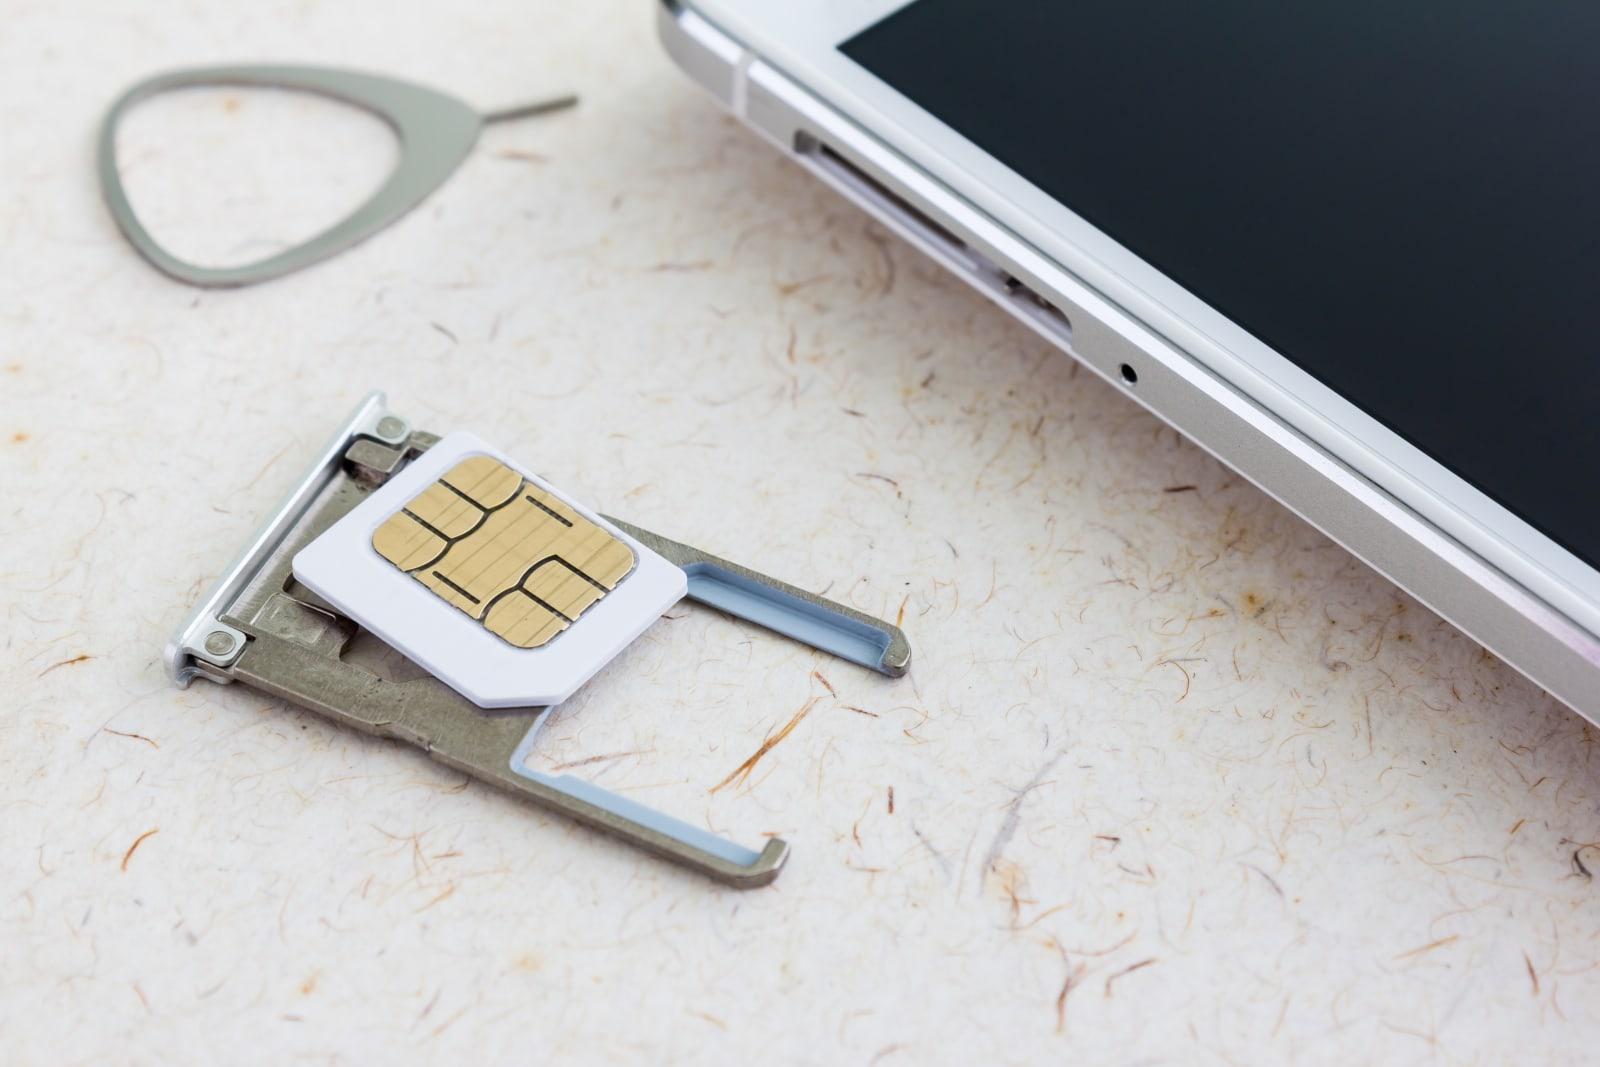 sim card with smartphone